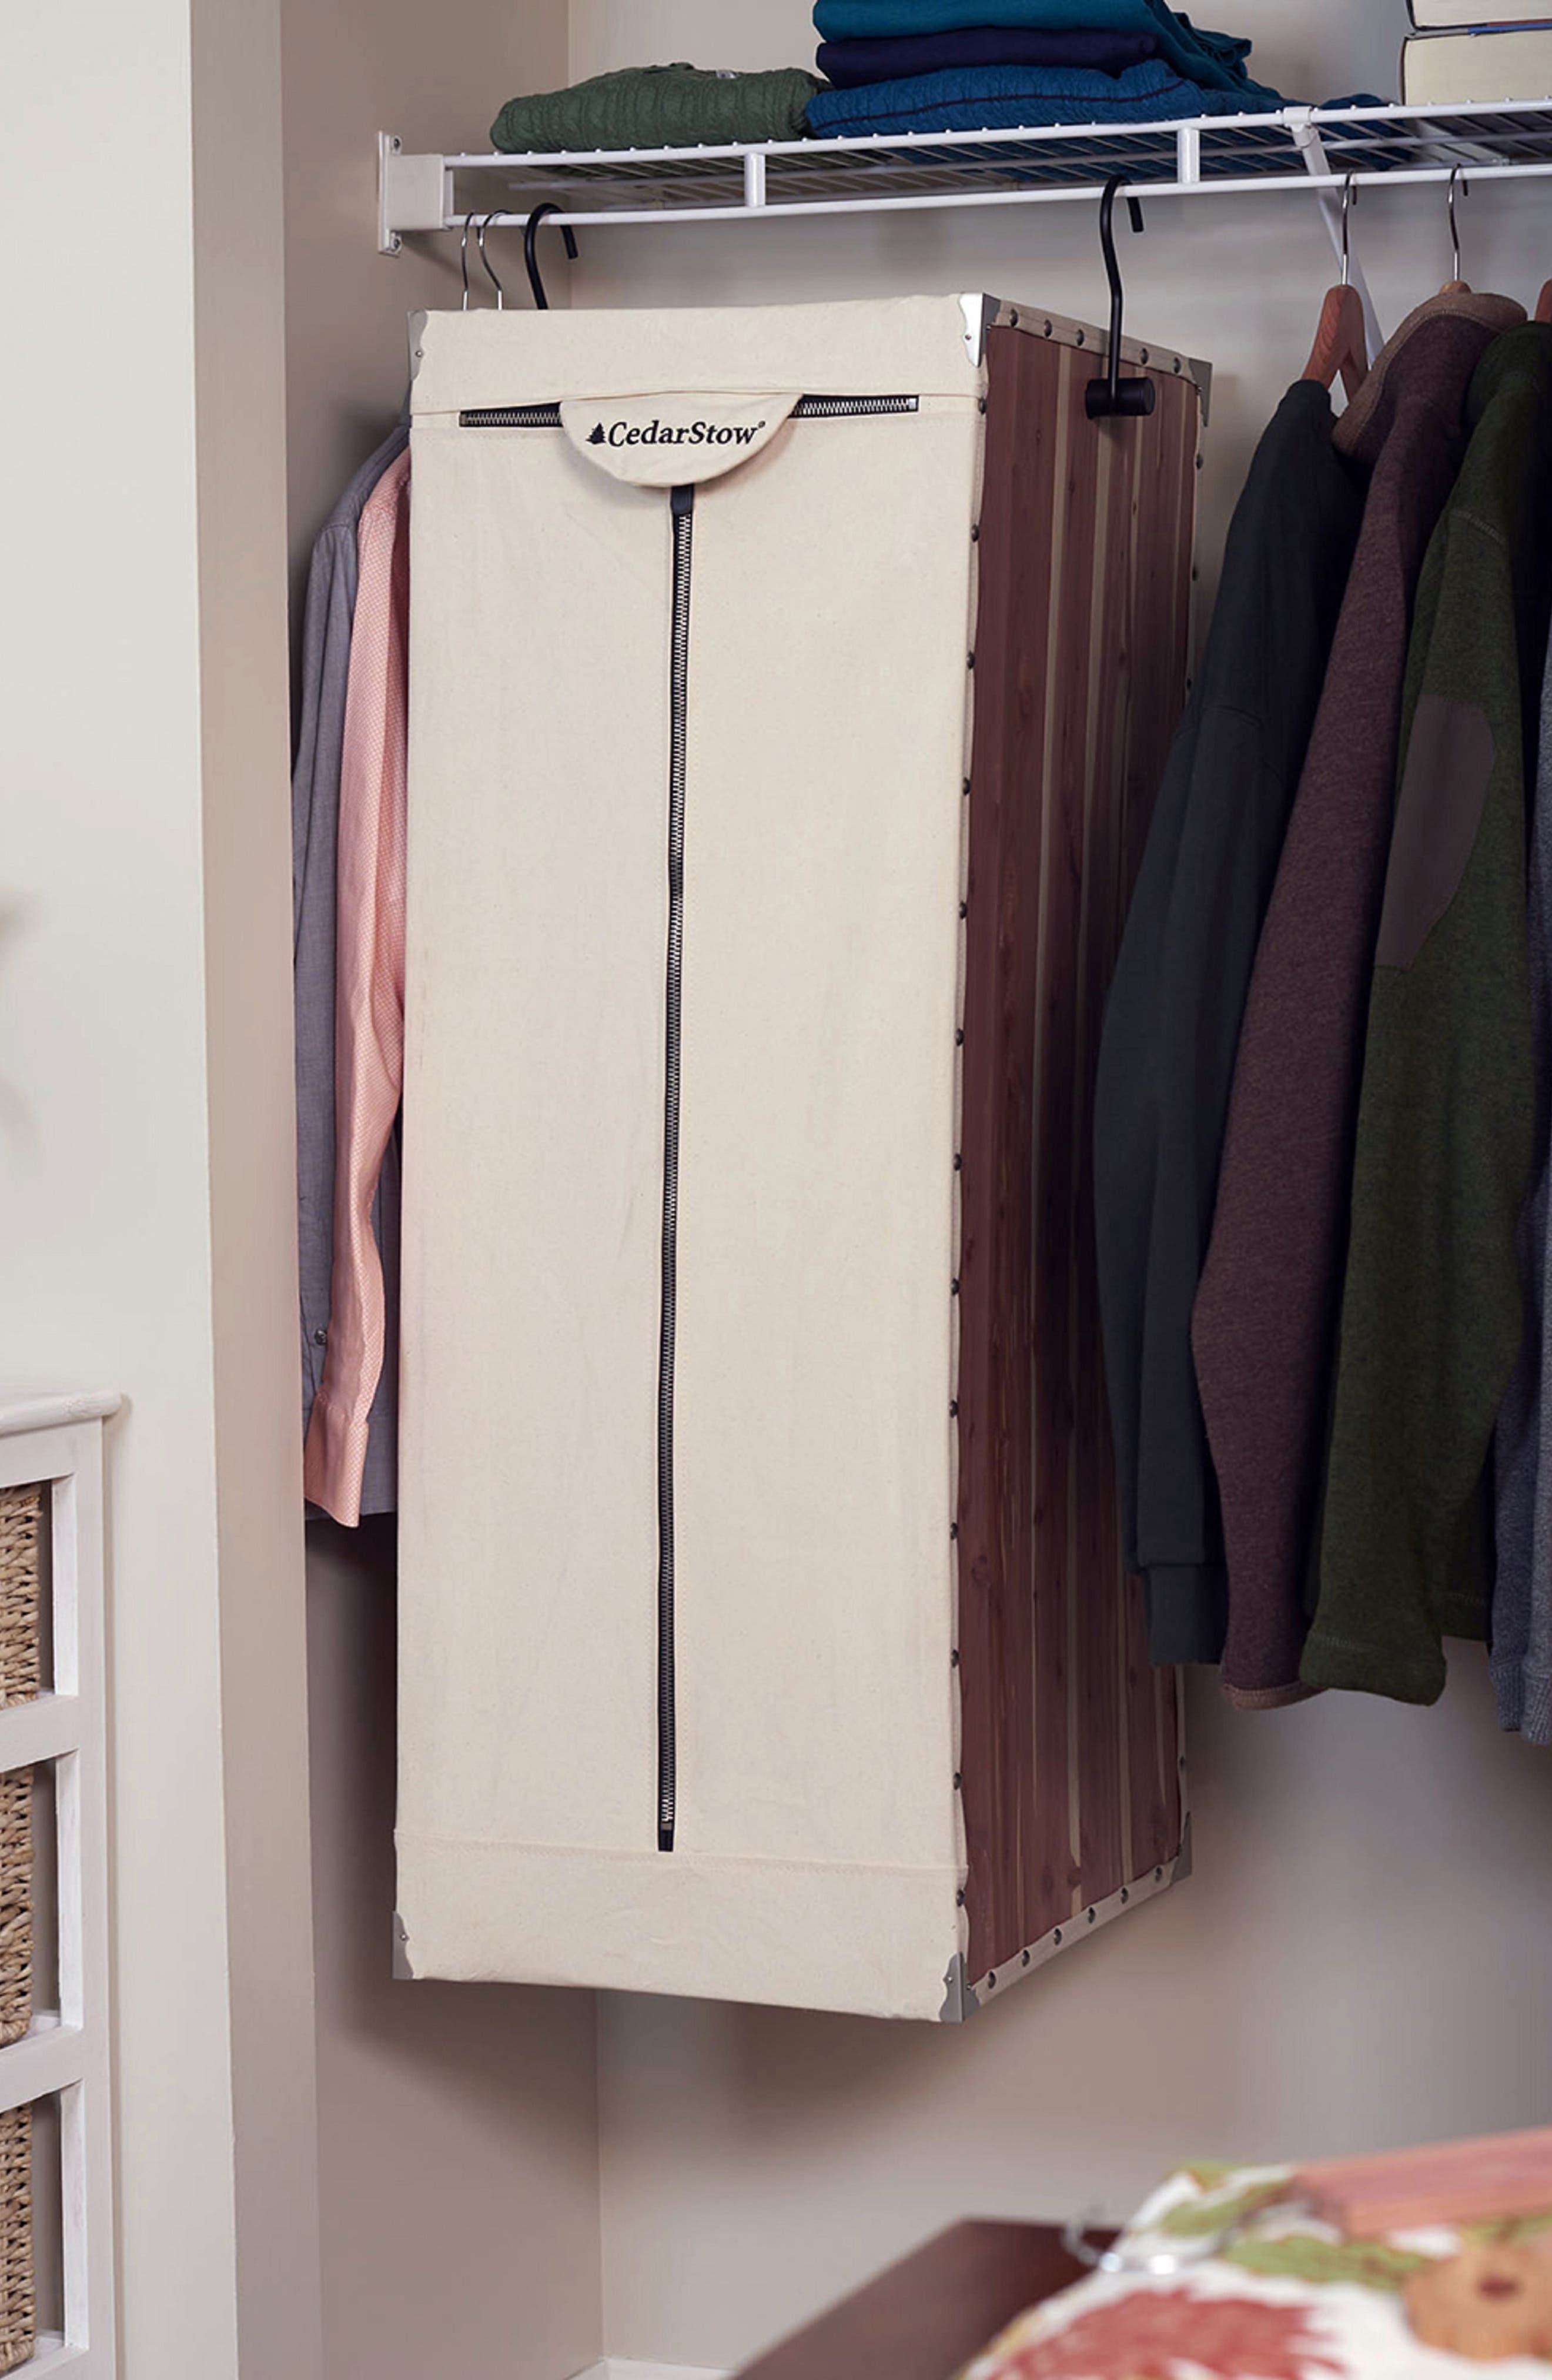 CedarStow Clothing Wardrobe,                             Alternate thumbnail 6, color,                             BEIGE AND CEDAR